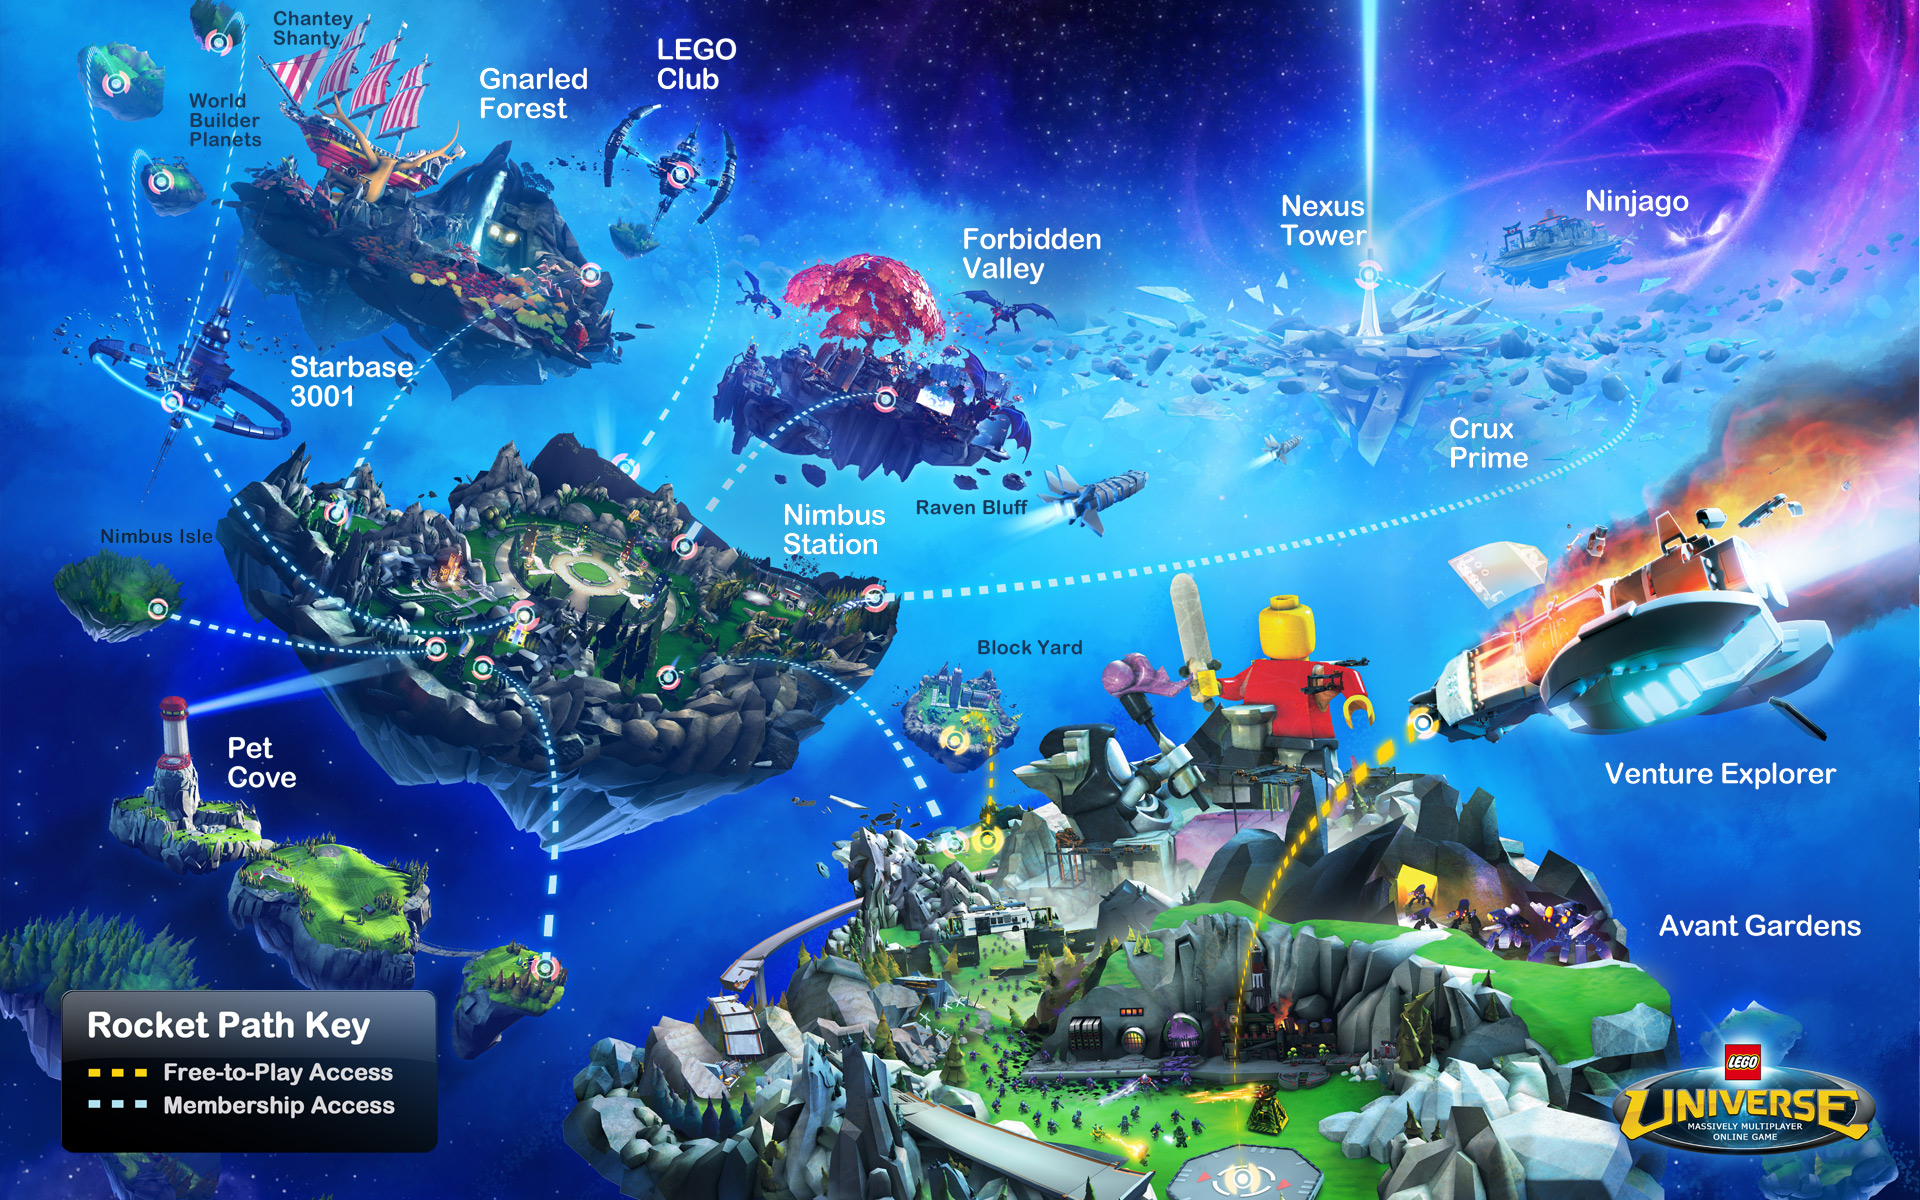 Image lu wallpaper map 1920x1200g lego universe wiki lu wallpaper map 1920x1200g gumiabroncs Image collections